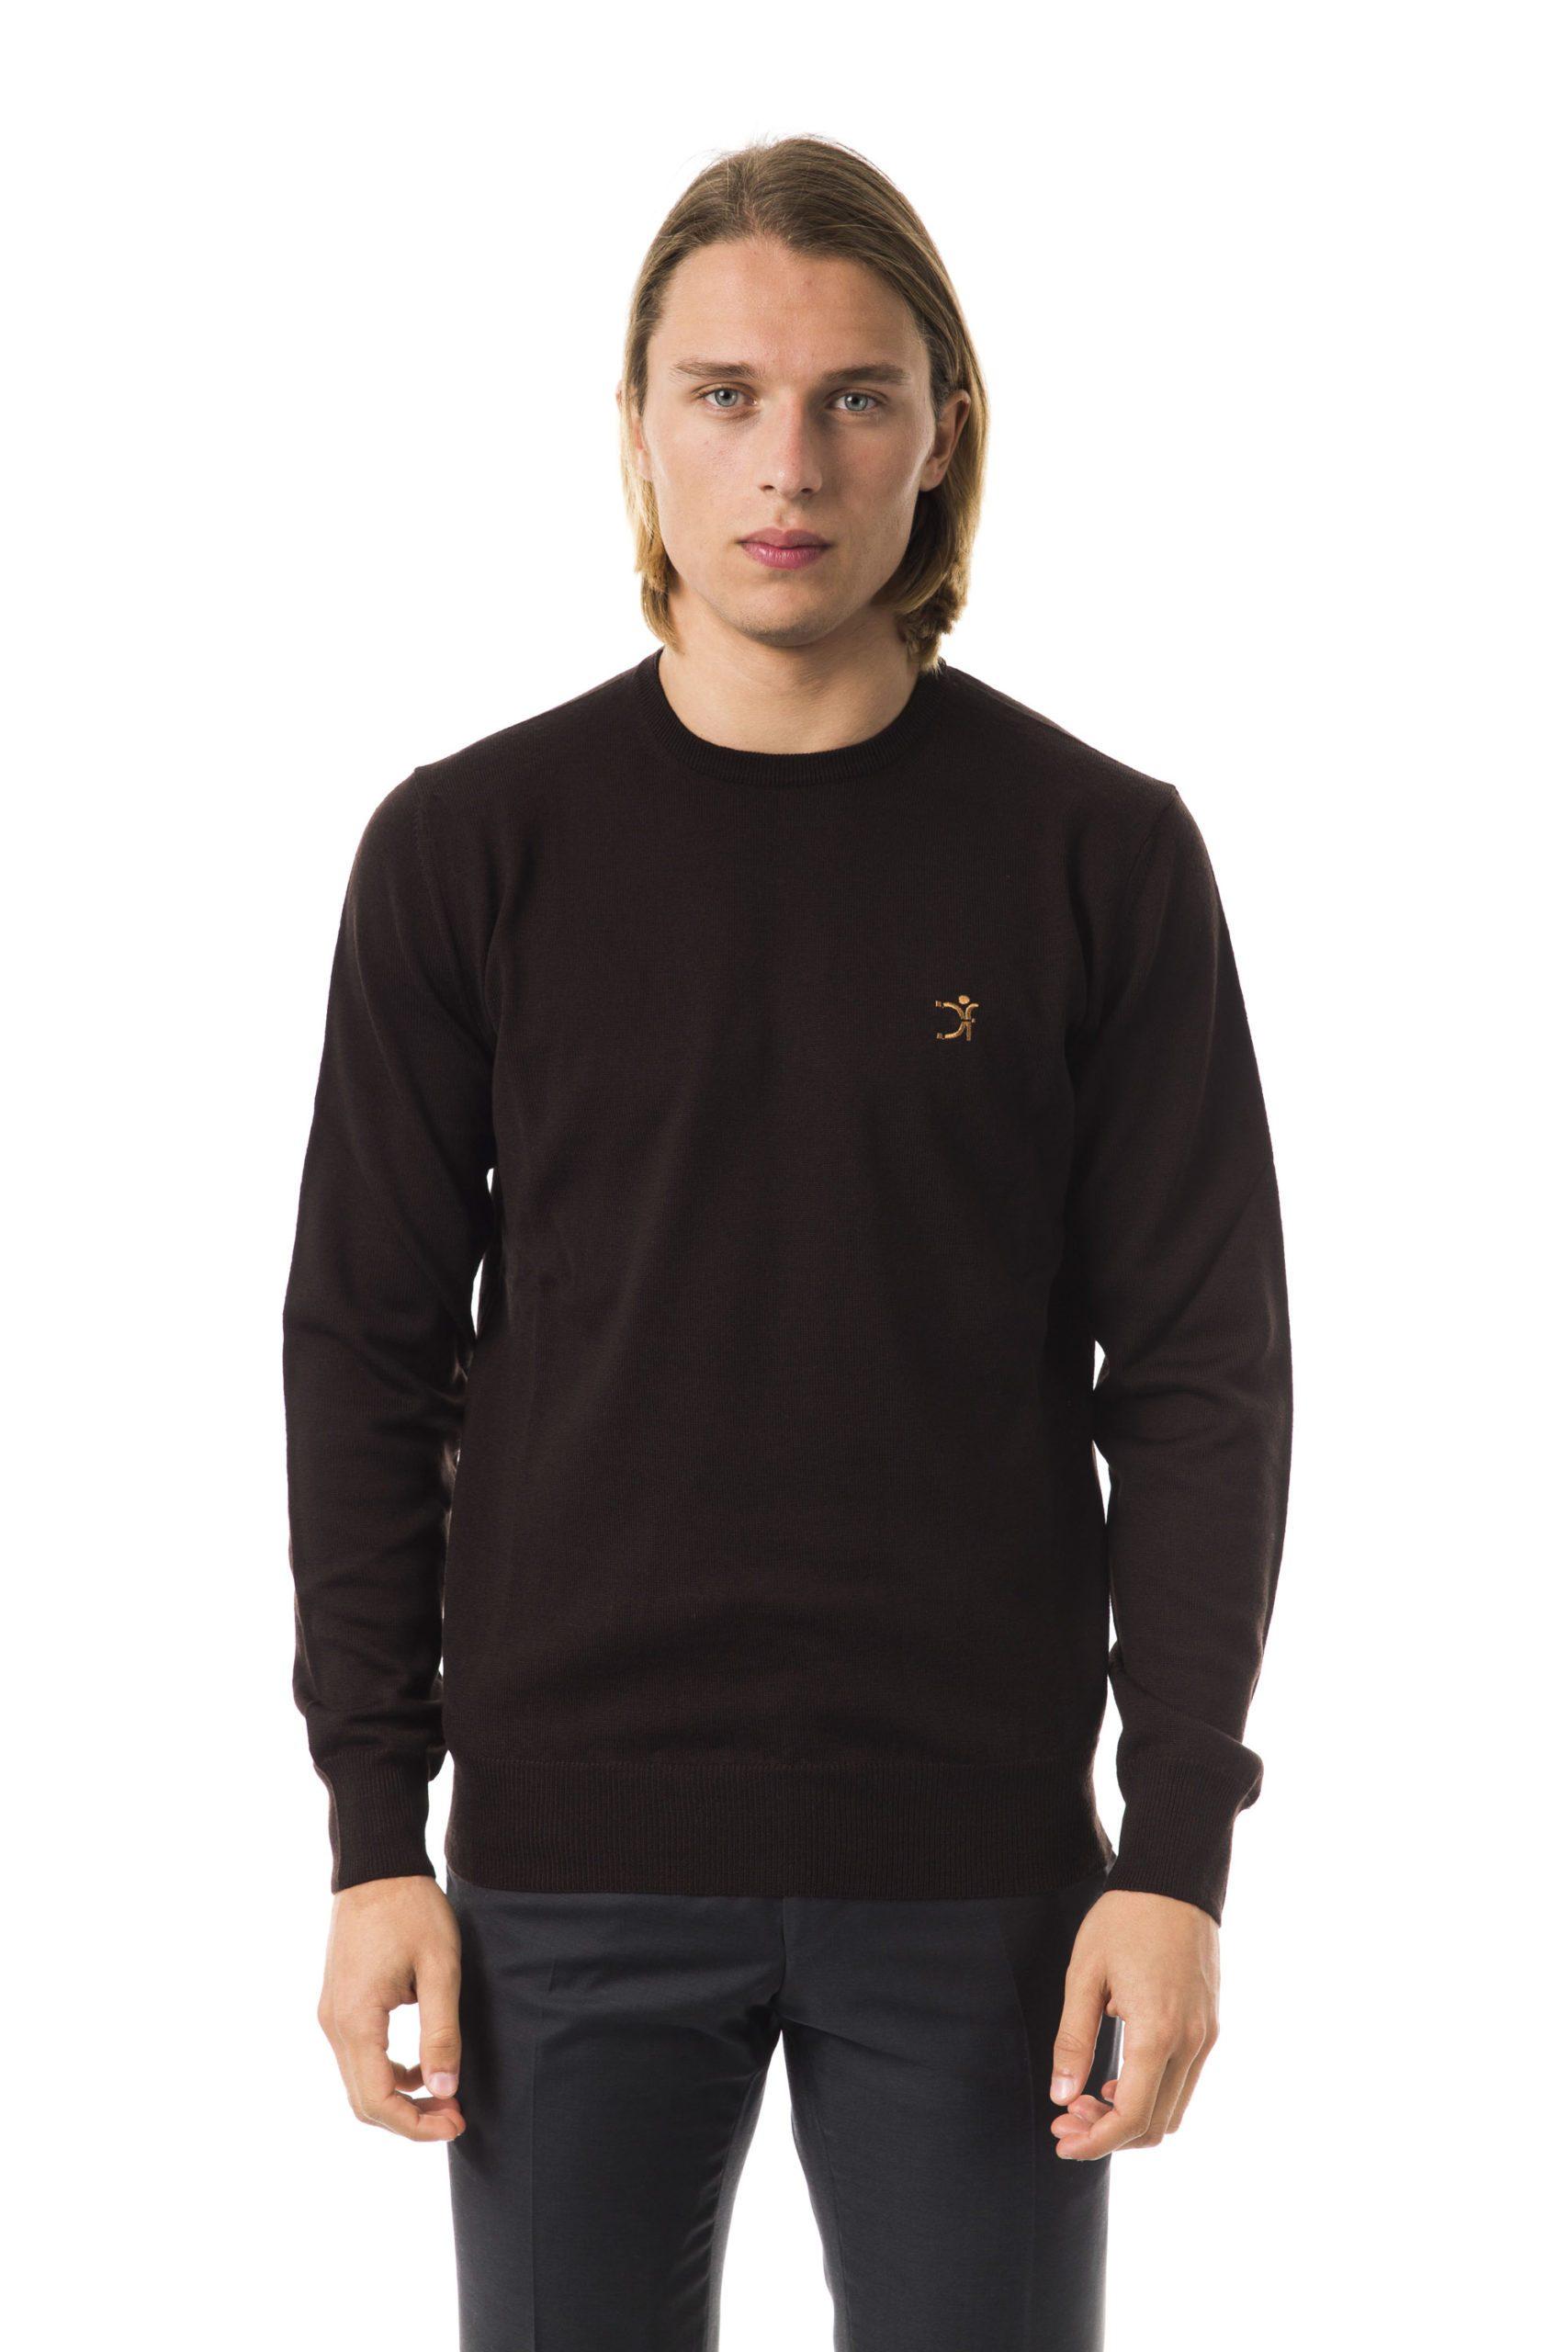 Uominitaliani Men's Moro Sweater Brown UO816644 - XS